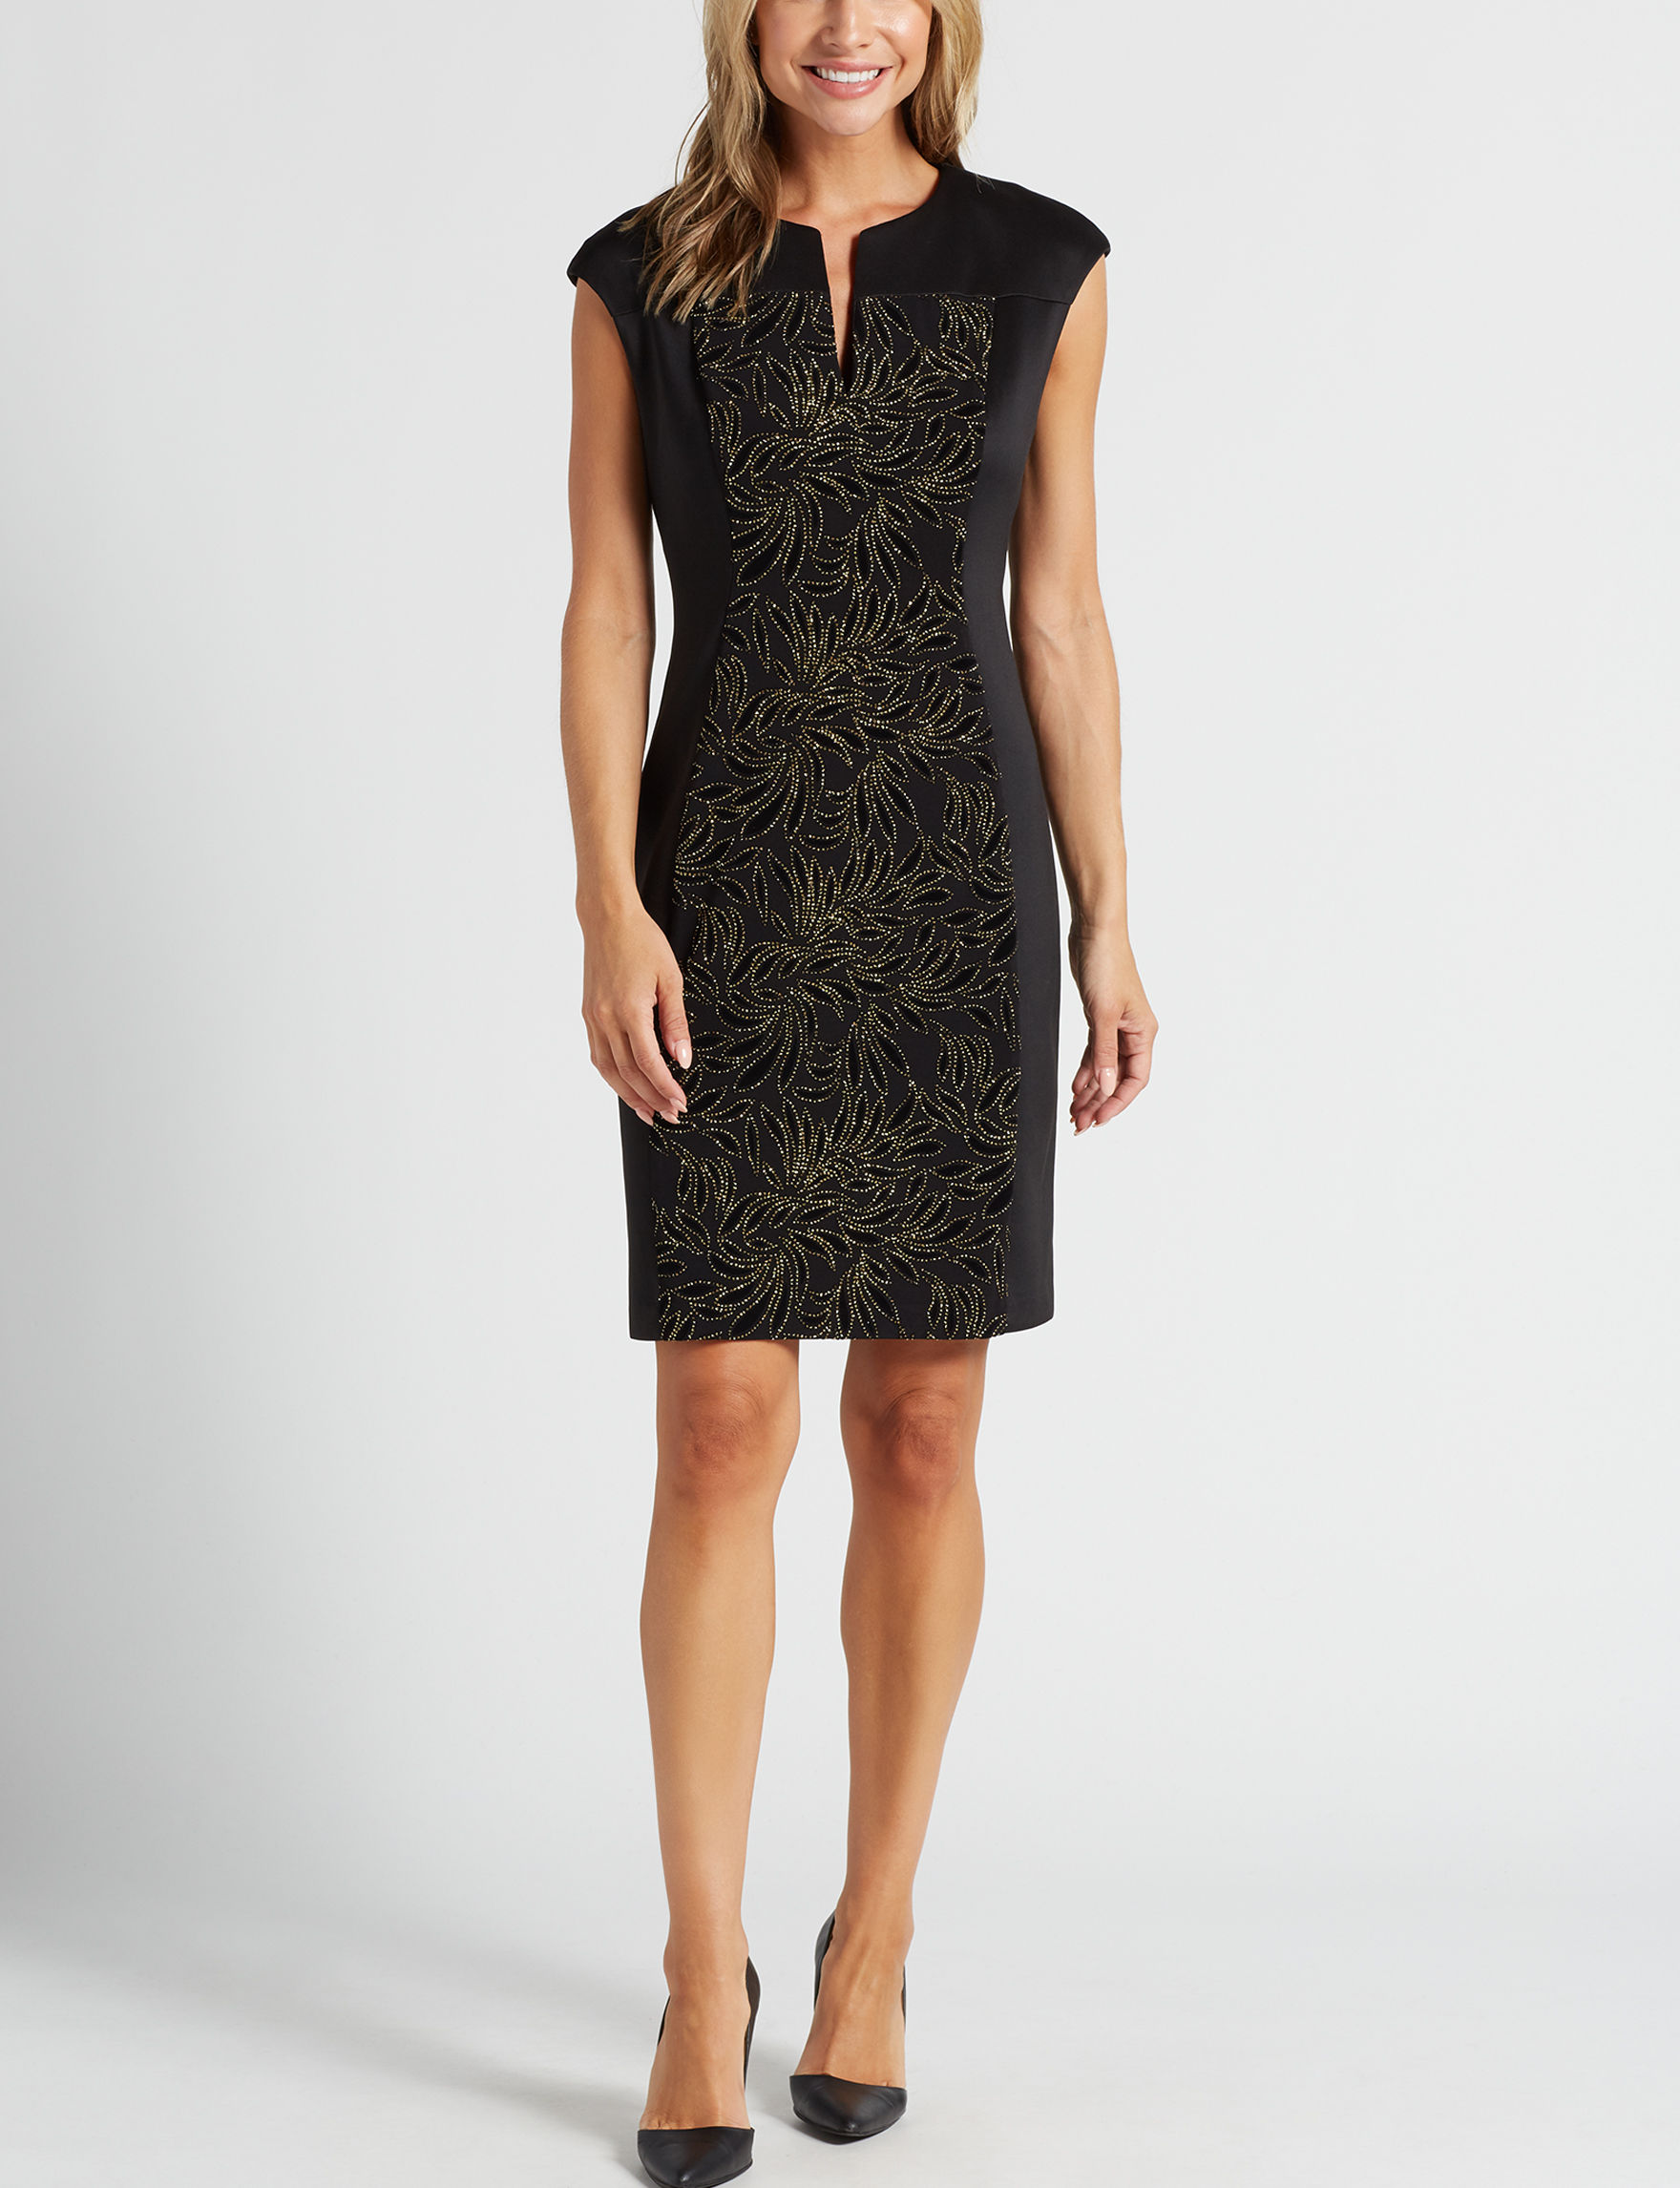 Connected Black / Gold Evening & Formal Sheath Dresses